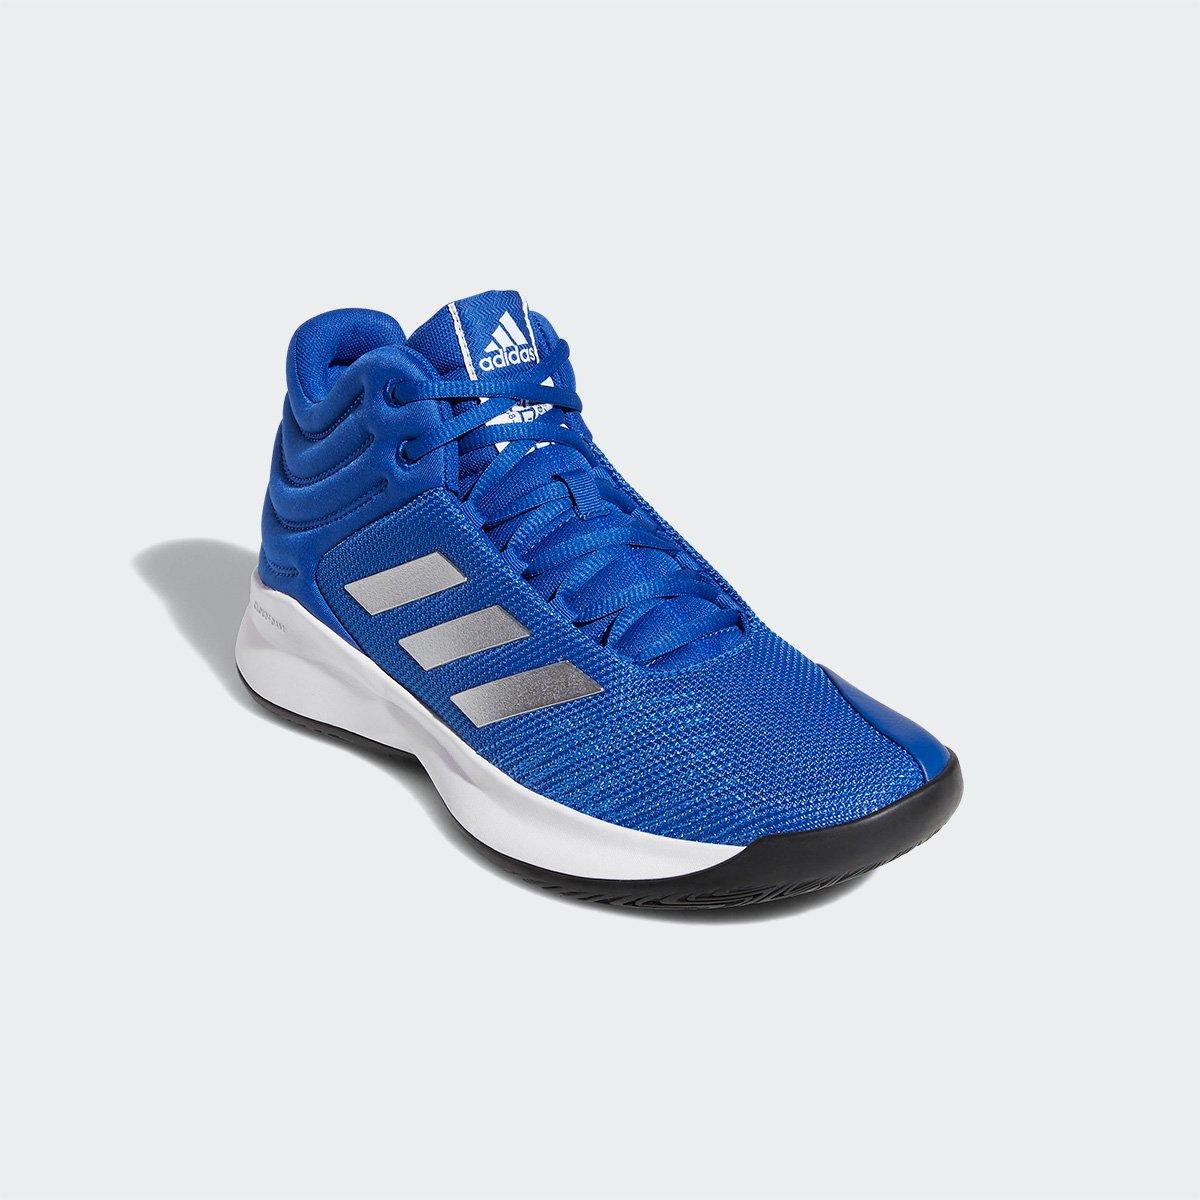 88269144874 Tênis Cano Alto Adidas Pro Spark 2018 Masculino - Azul e Branco - Compre  Agora